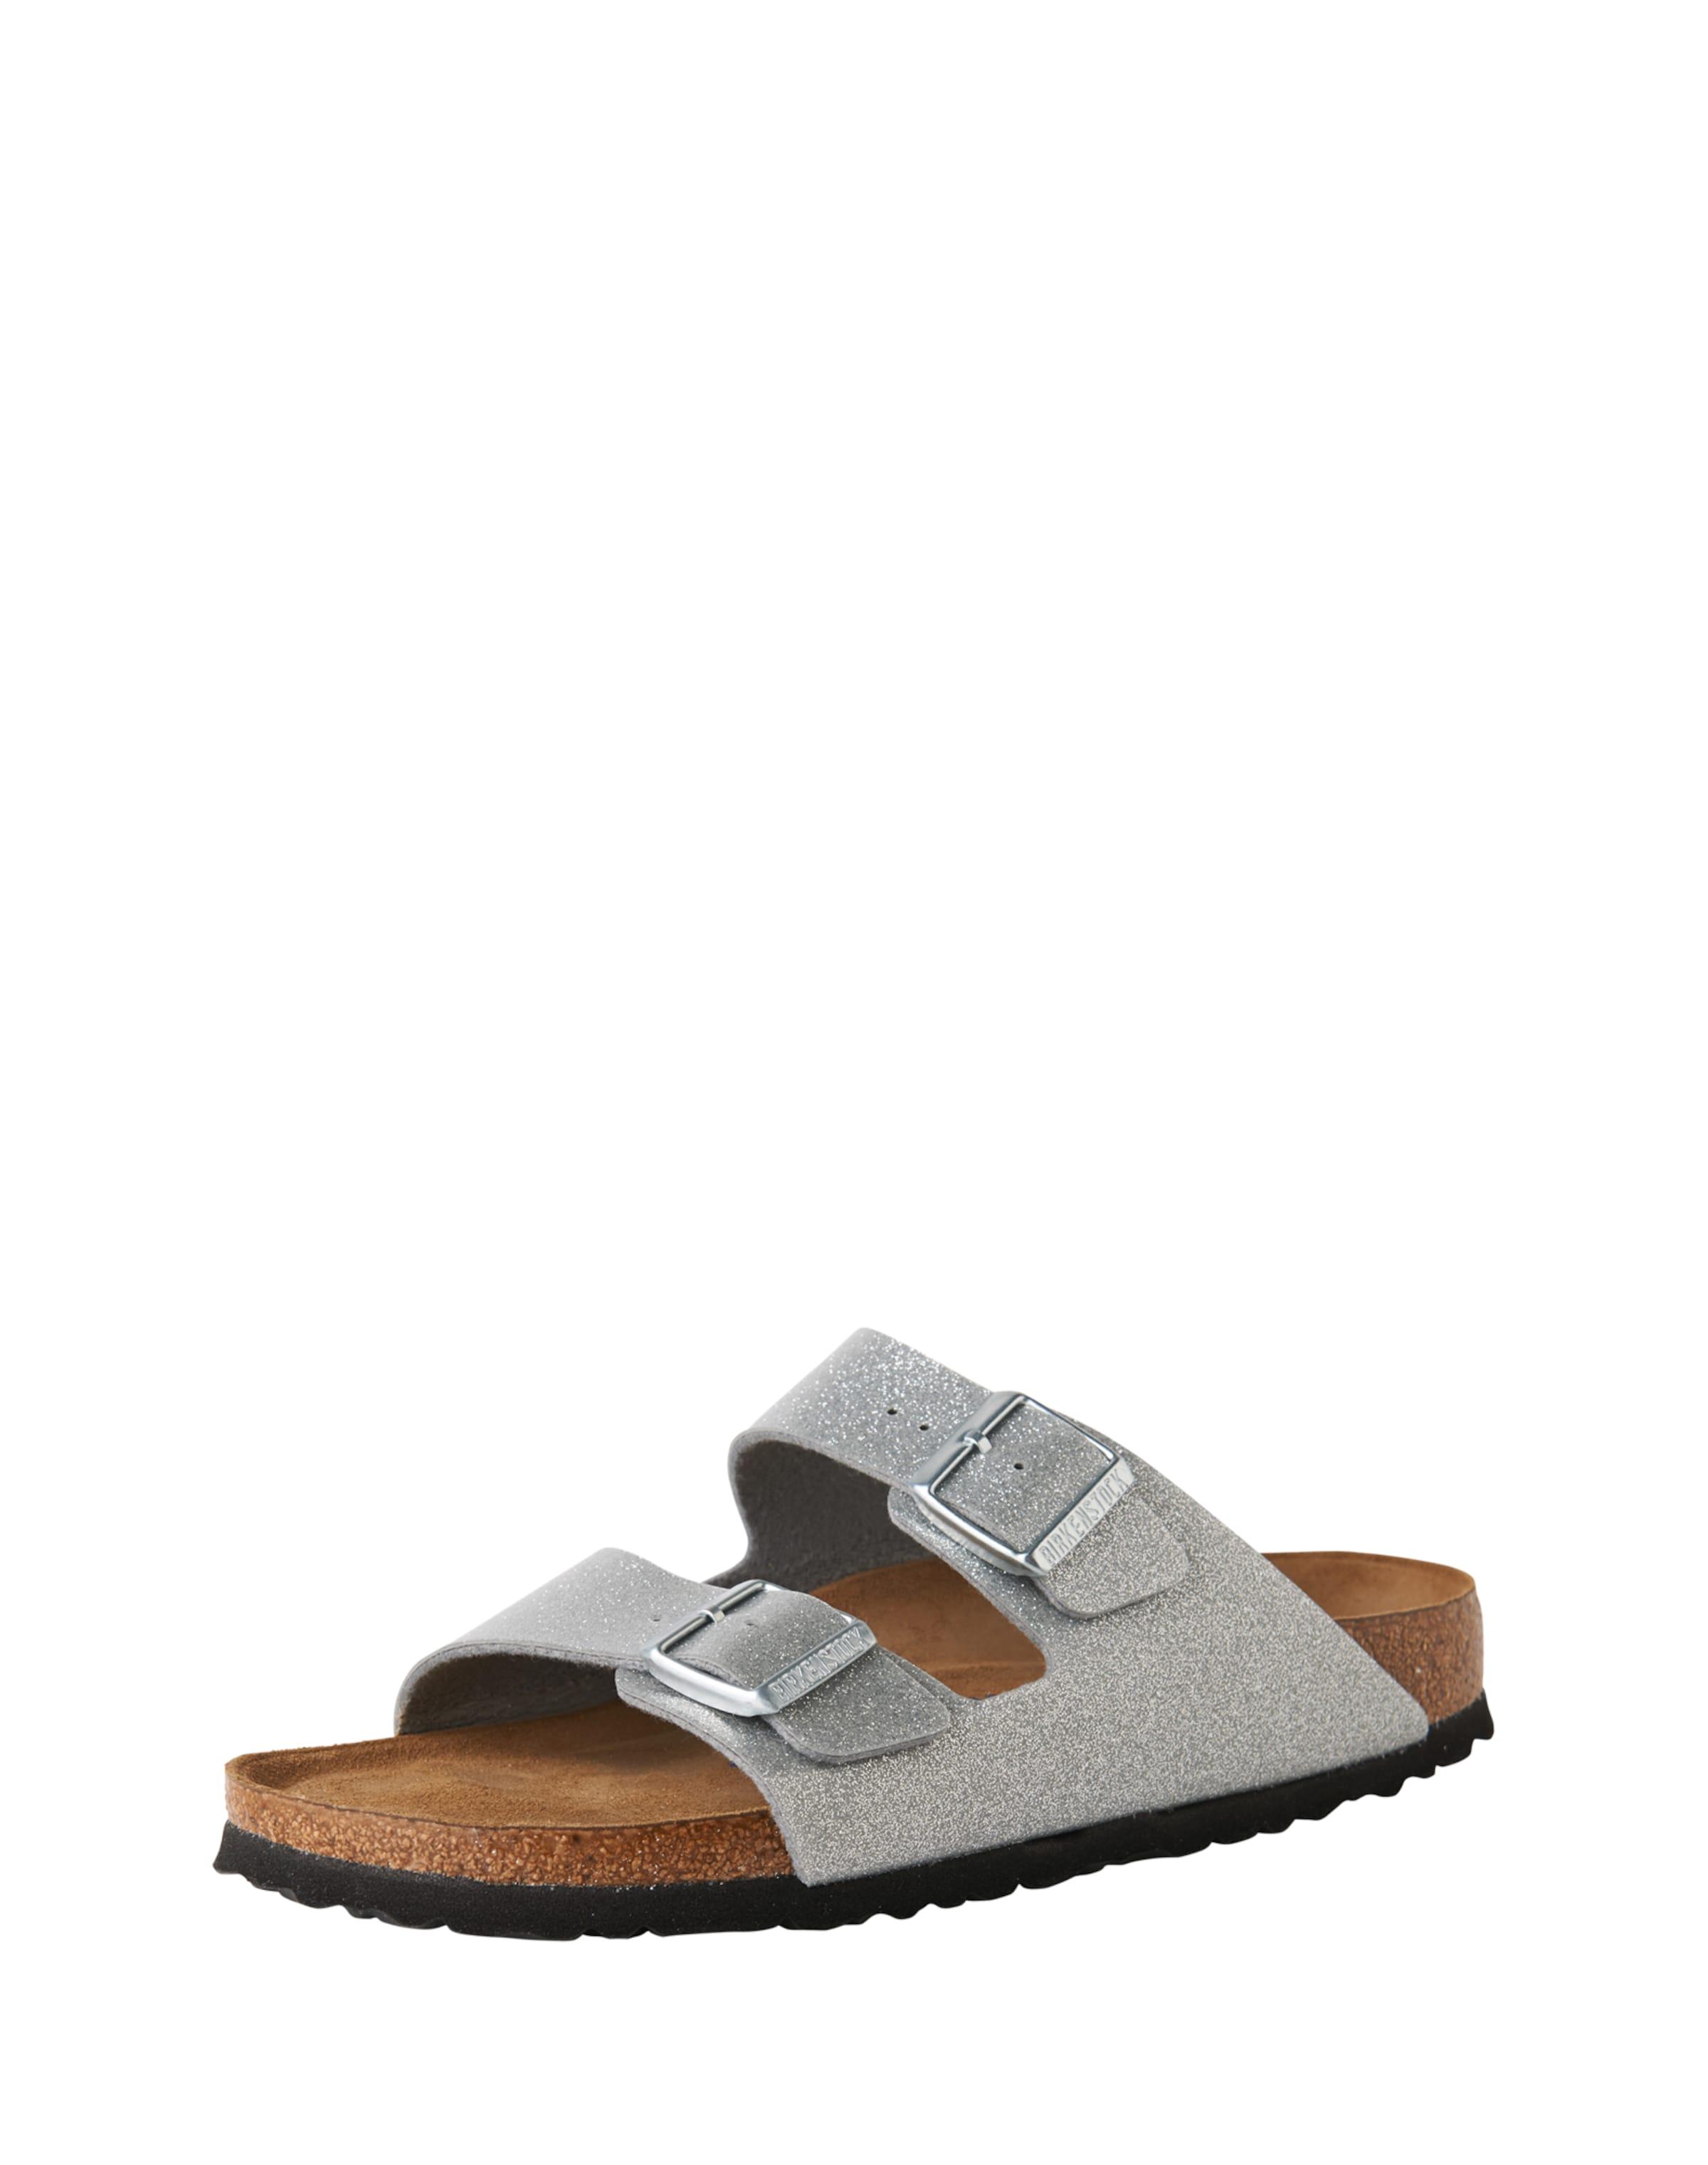 BIRKENSTOCK Sandale Arizona Verschleißfeste billige Schuhe